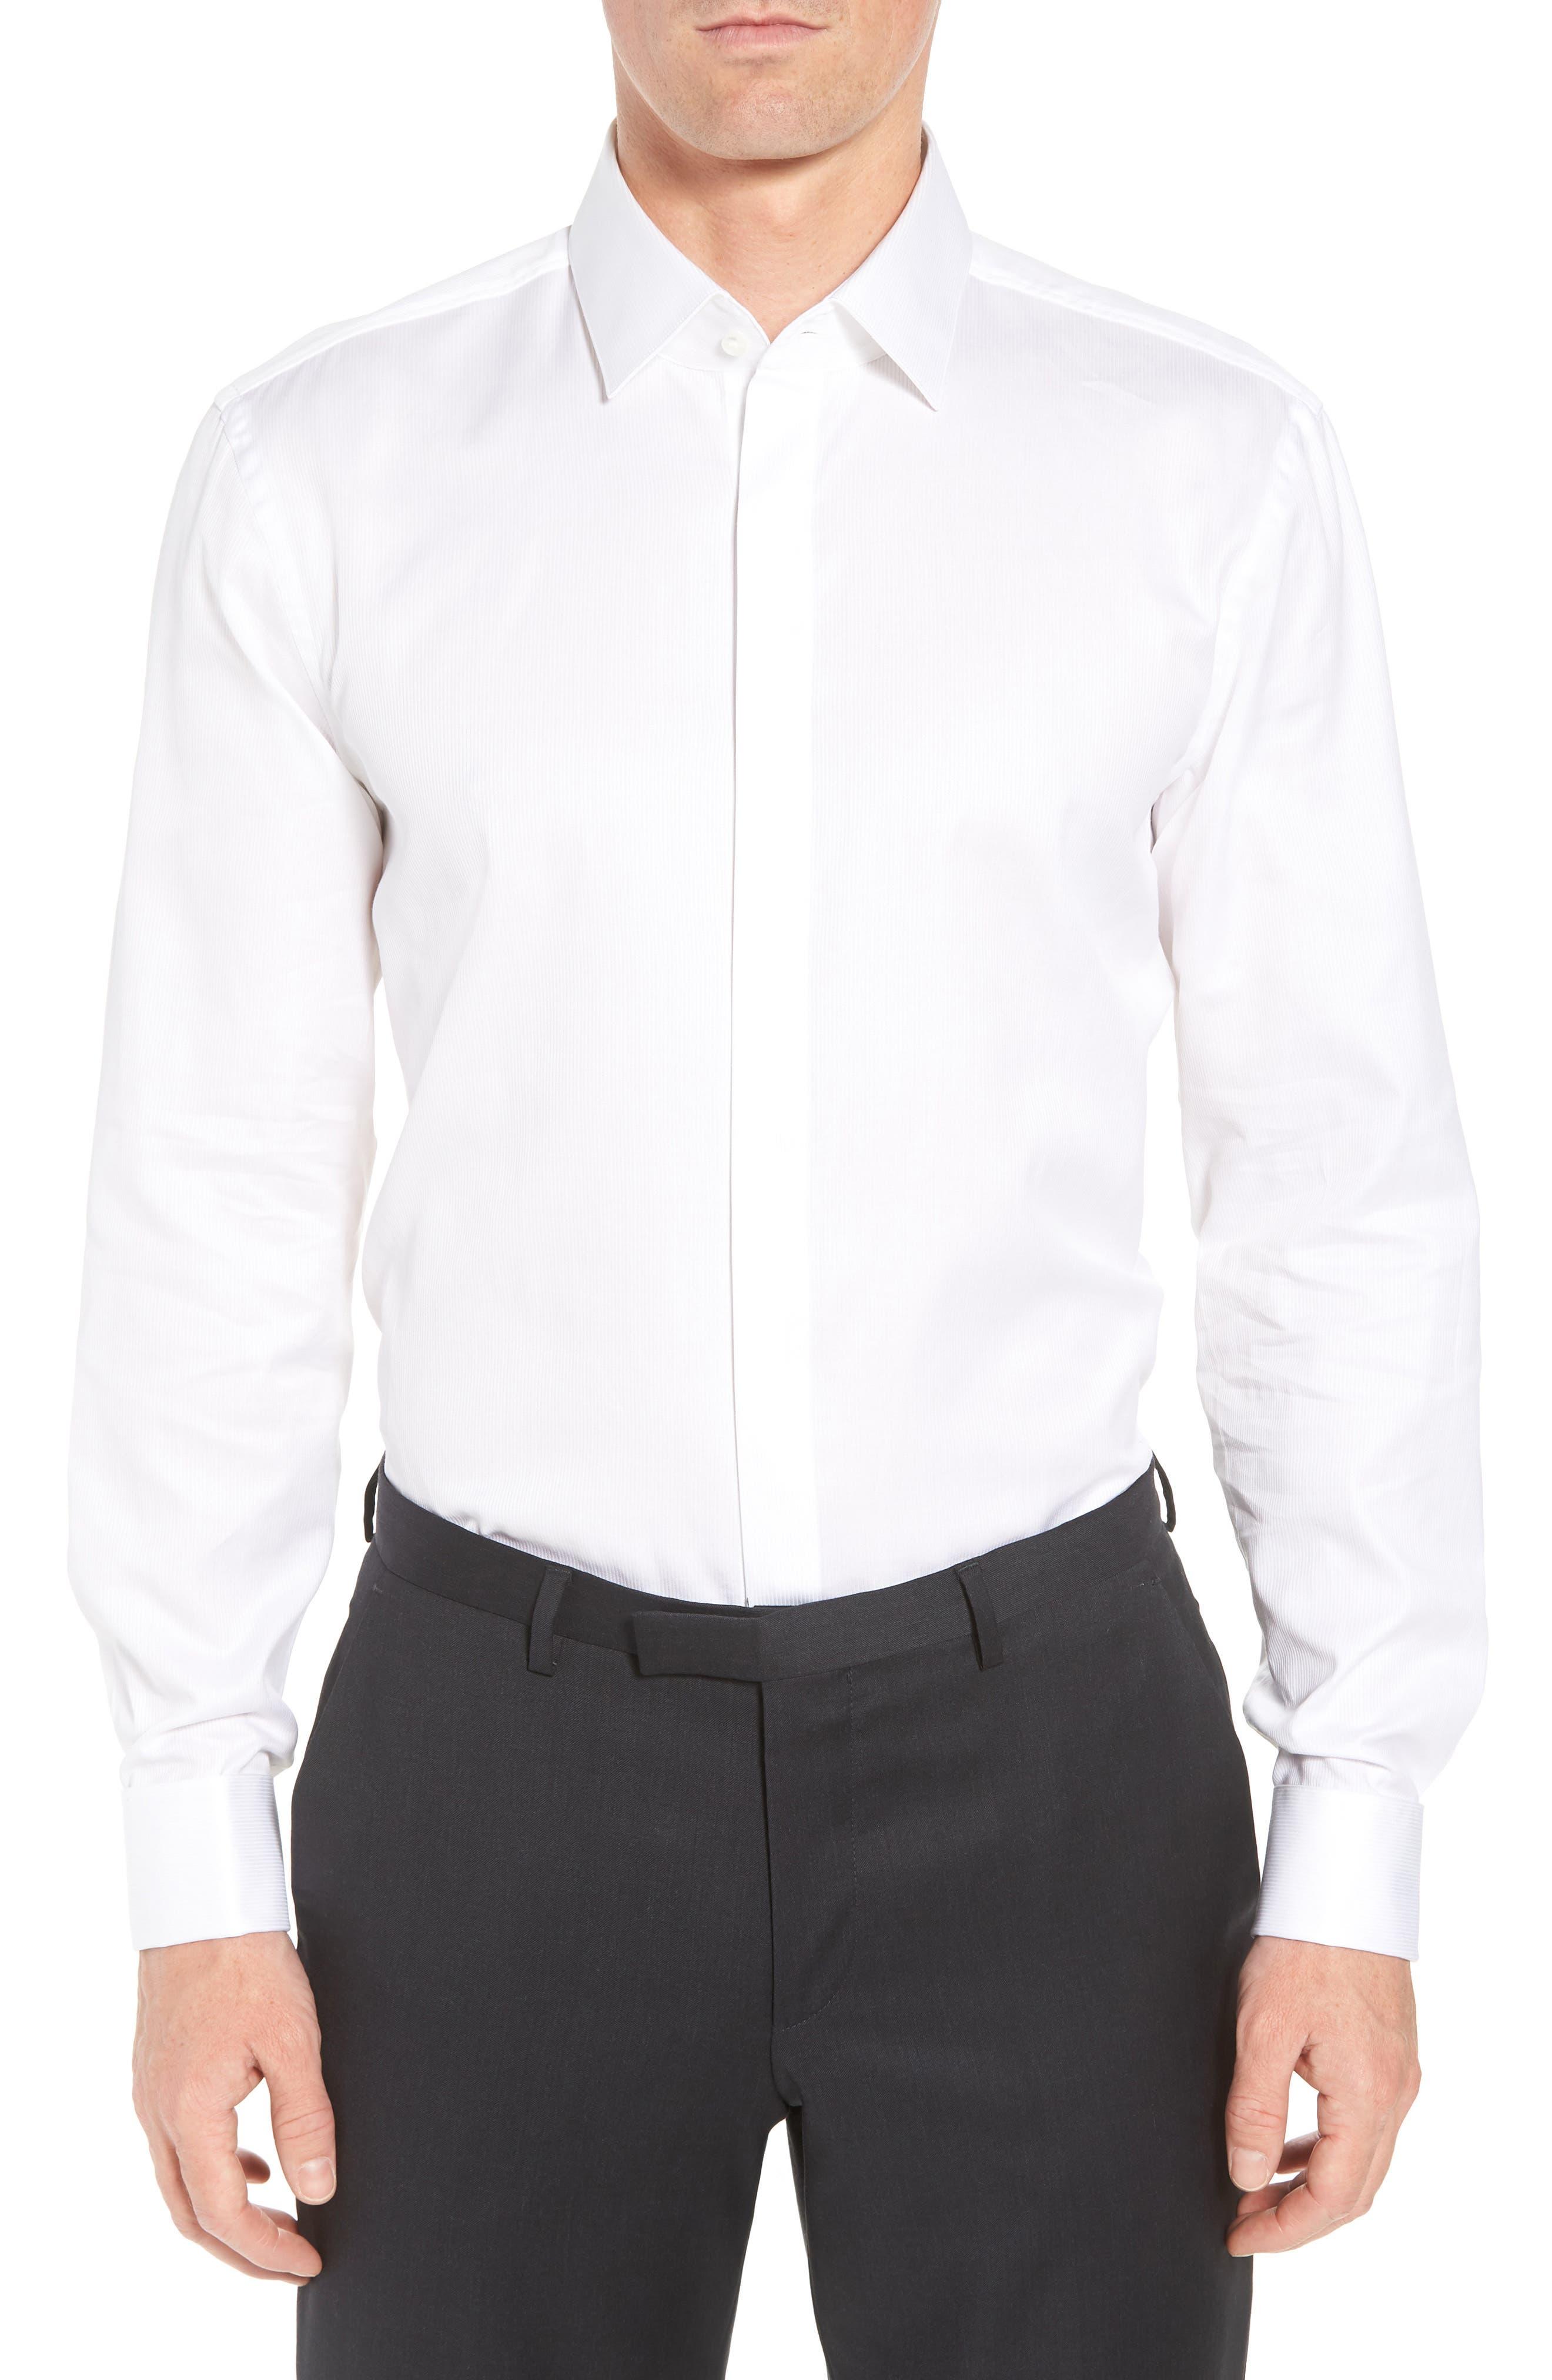 Myron Sharp Fit Tuxedo Shirt,                         Main,                         color, White